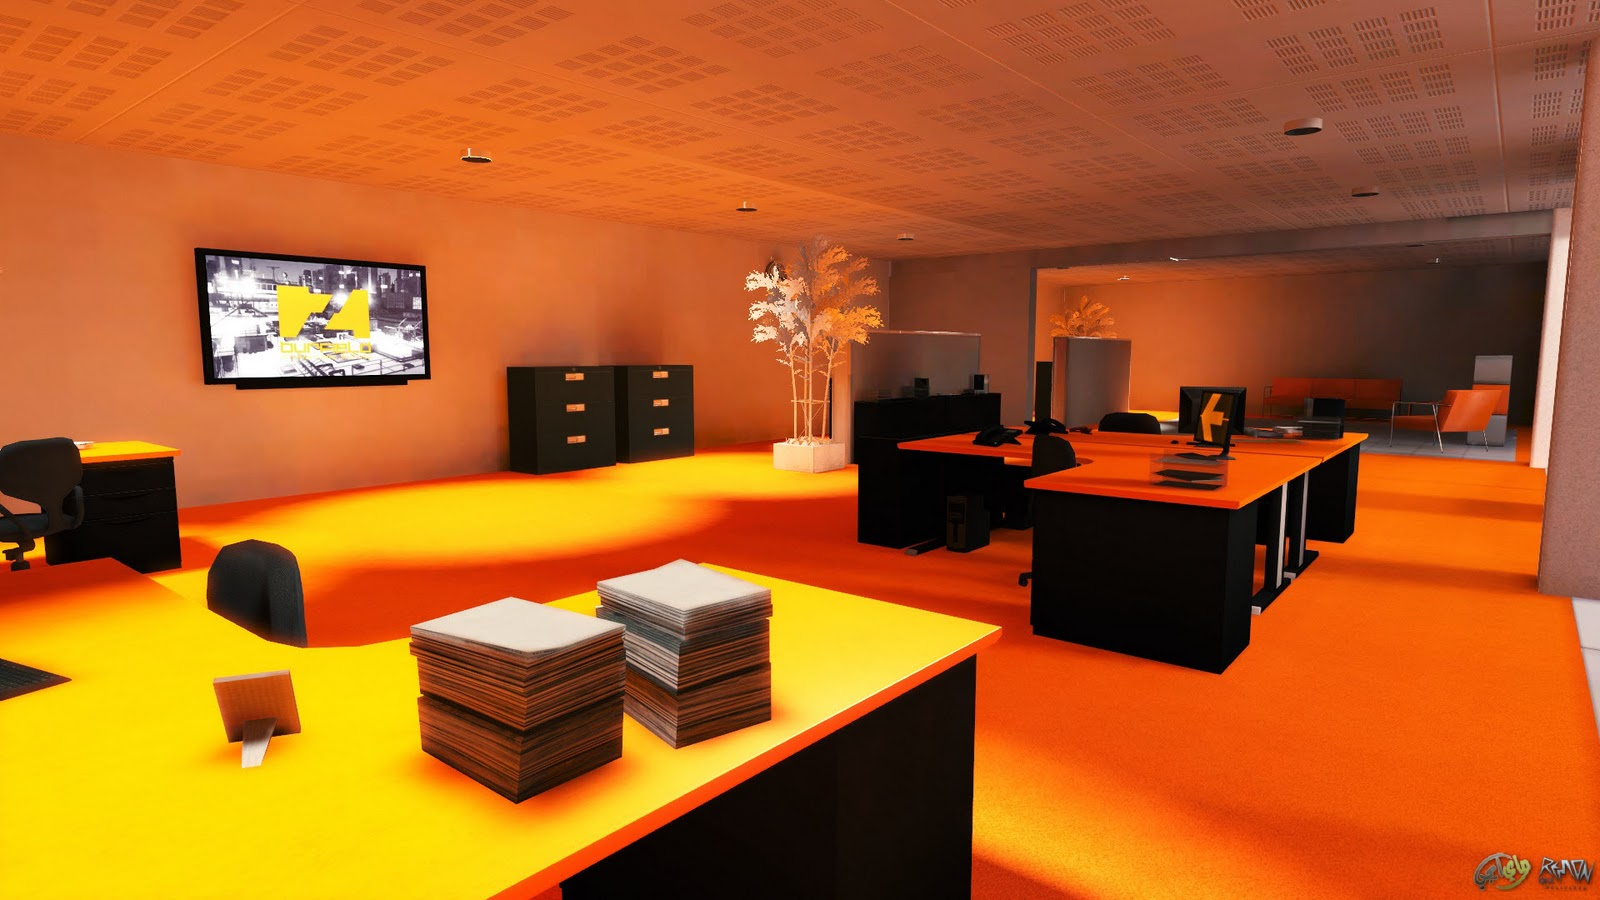 wallpaper bureau windows wallpaper pictures gallery. Black Bedroom Furniture Sets. Home Design Ideas